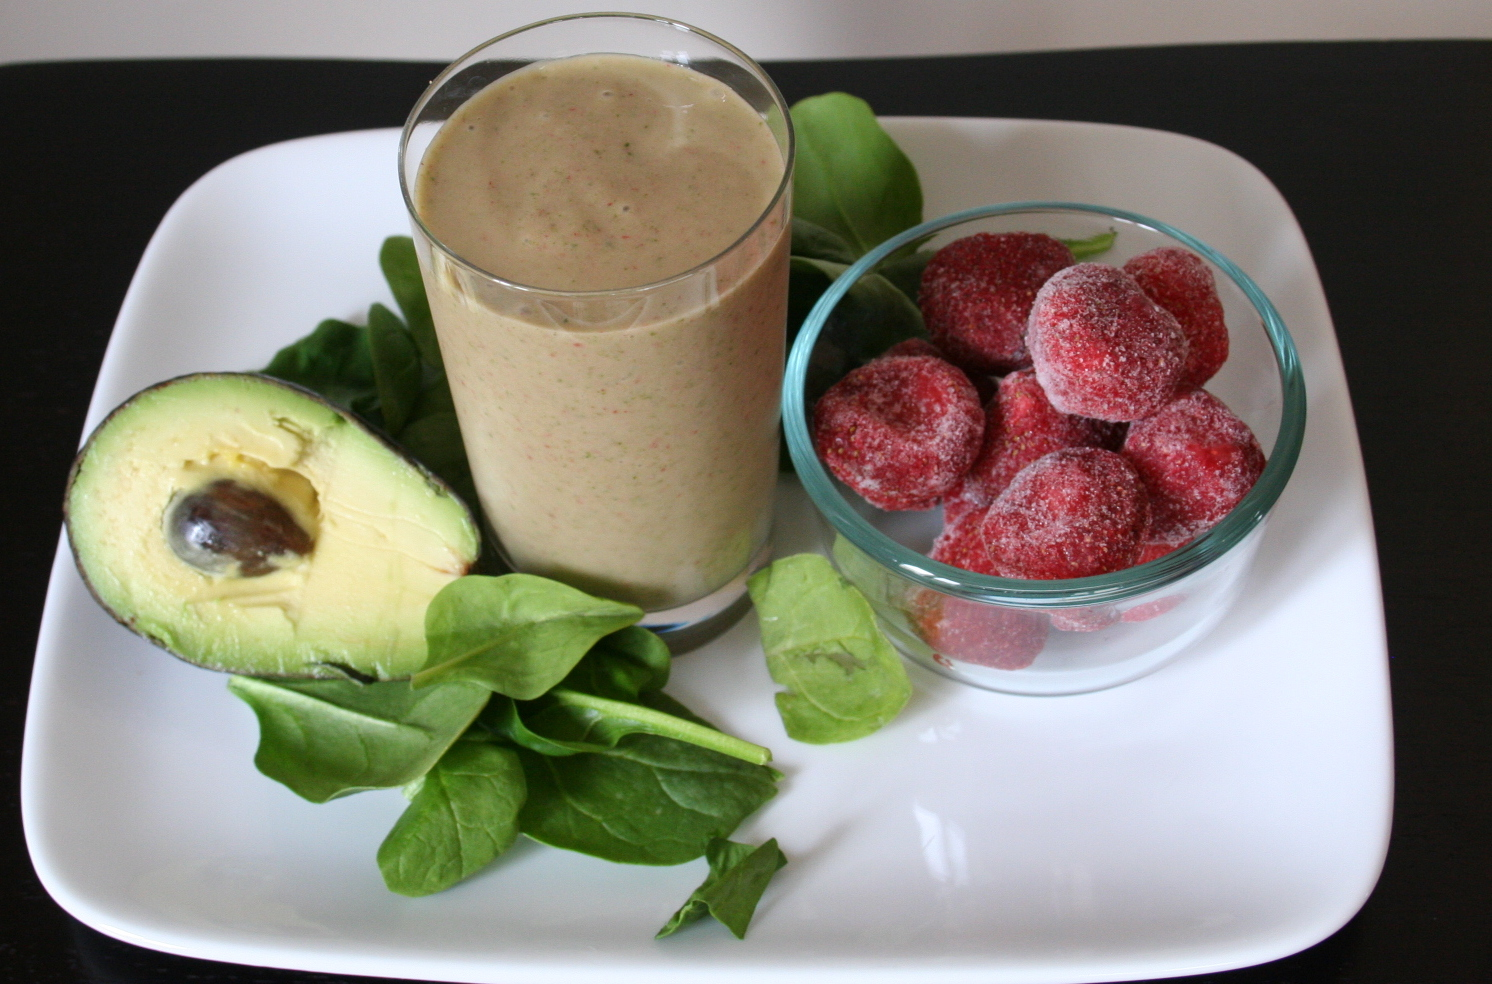 The Healthy Happy Wife Strawberry Spinach Avocado